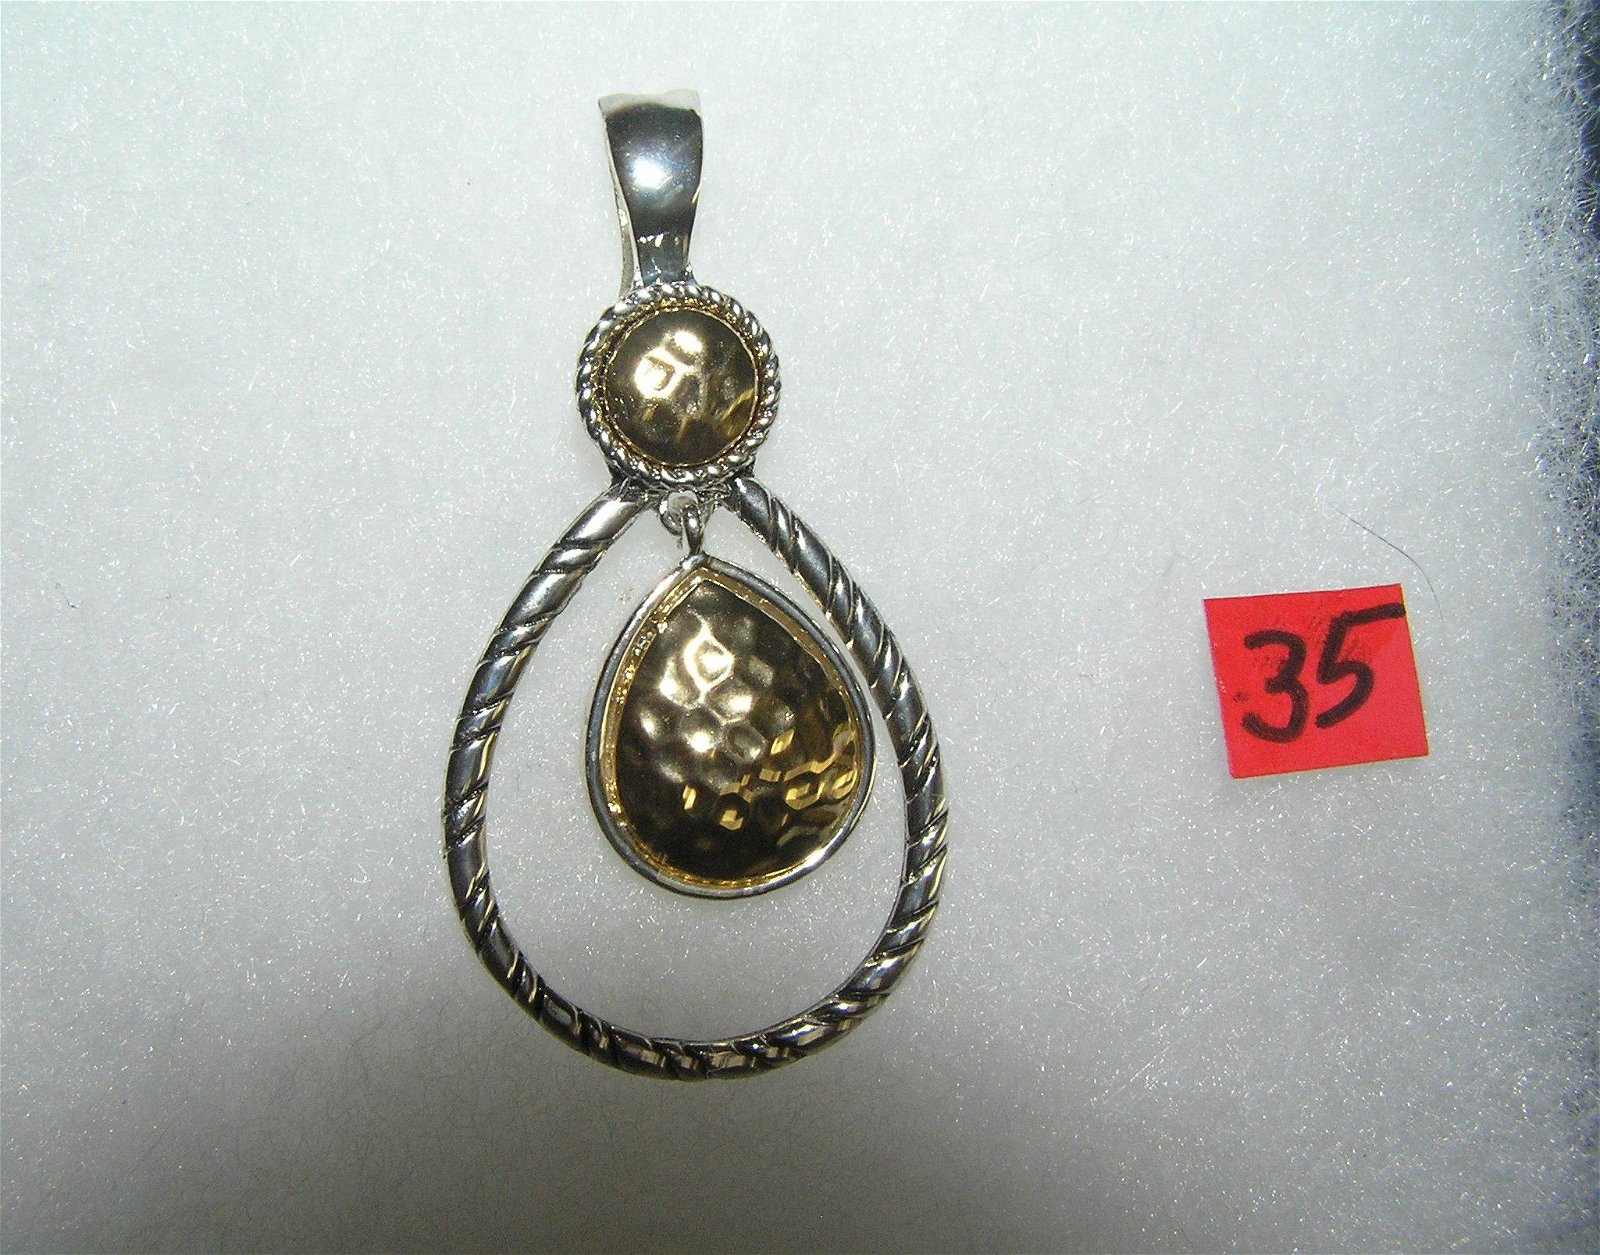 Quality necklace pendant